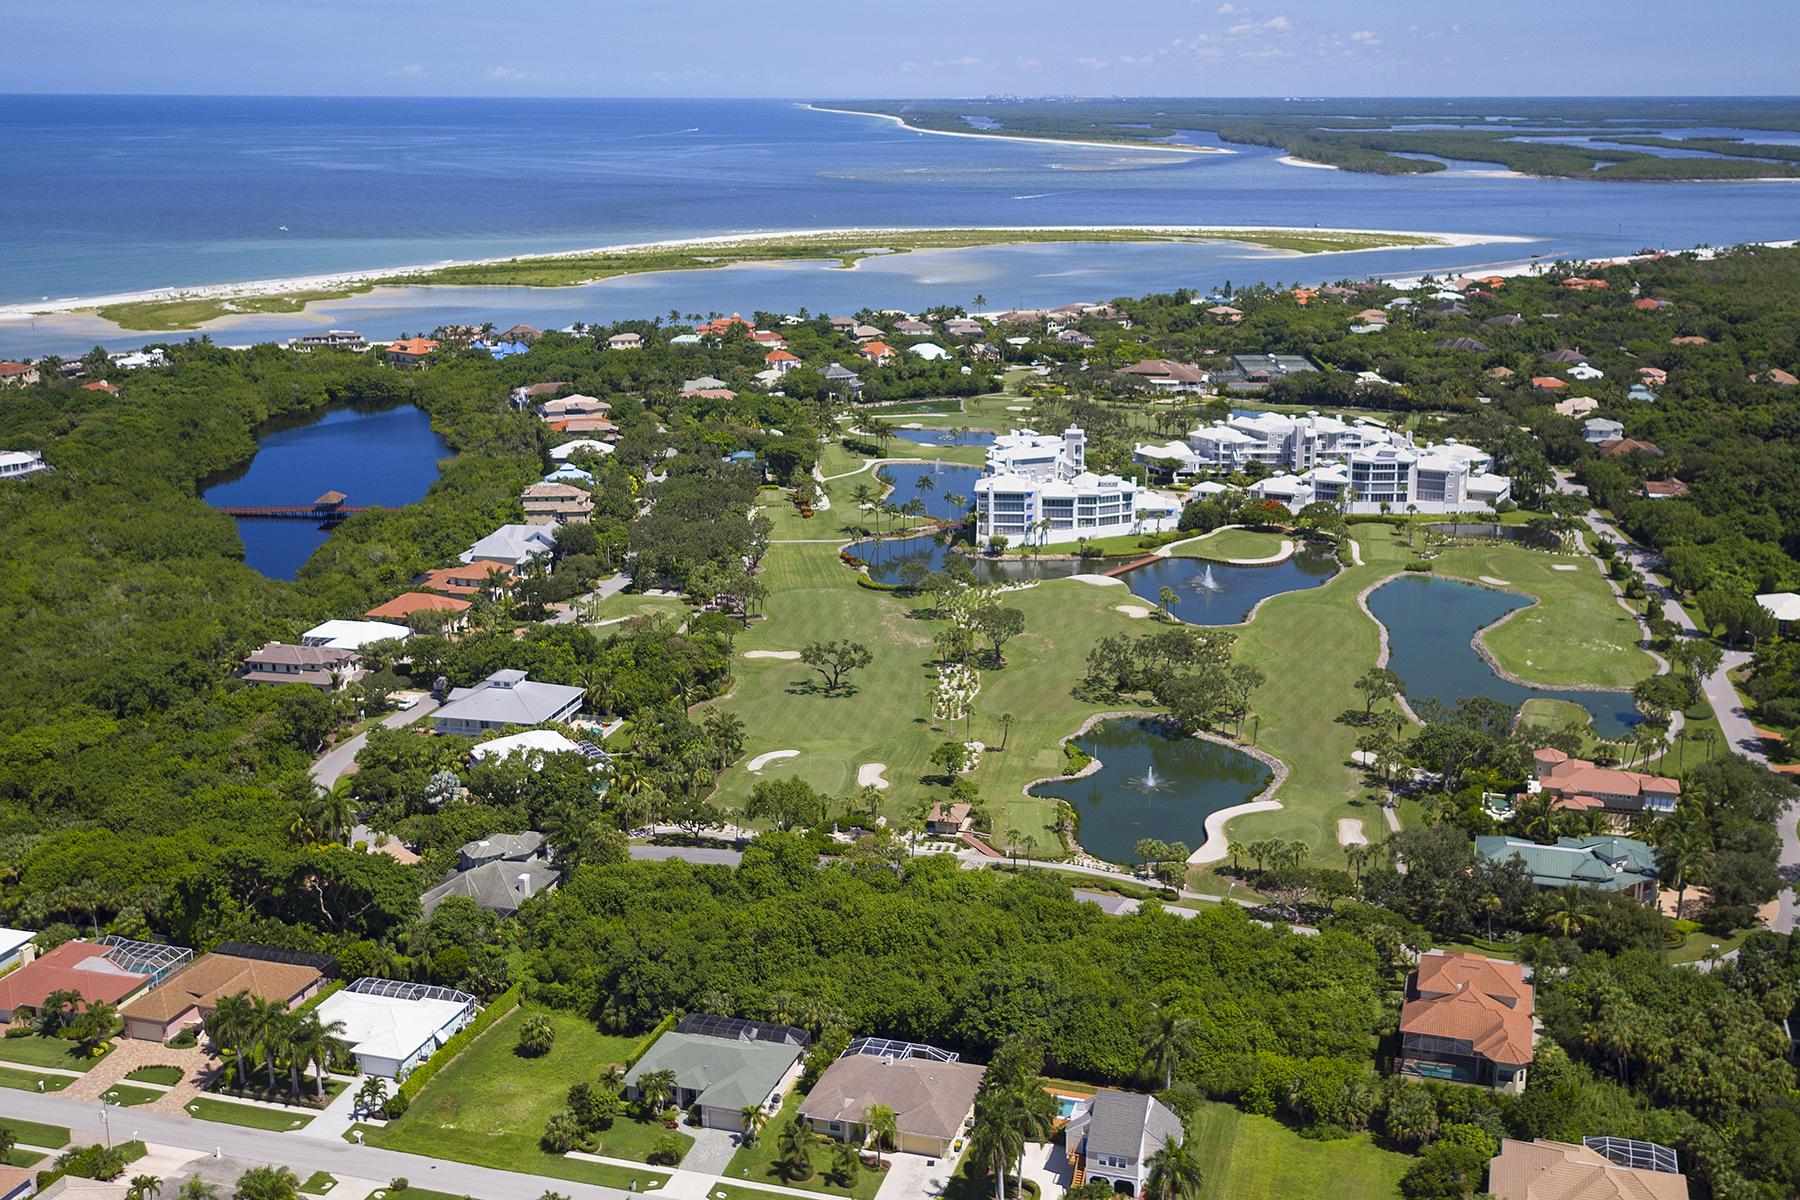 Terreno para Venda às MARCO ISLAND - HIDEAWAY BEACH 261 Hideaway Cir S Marco Island, Florida, 34145 Estados Unidos